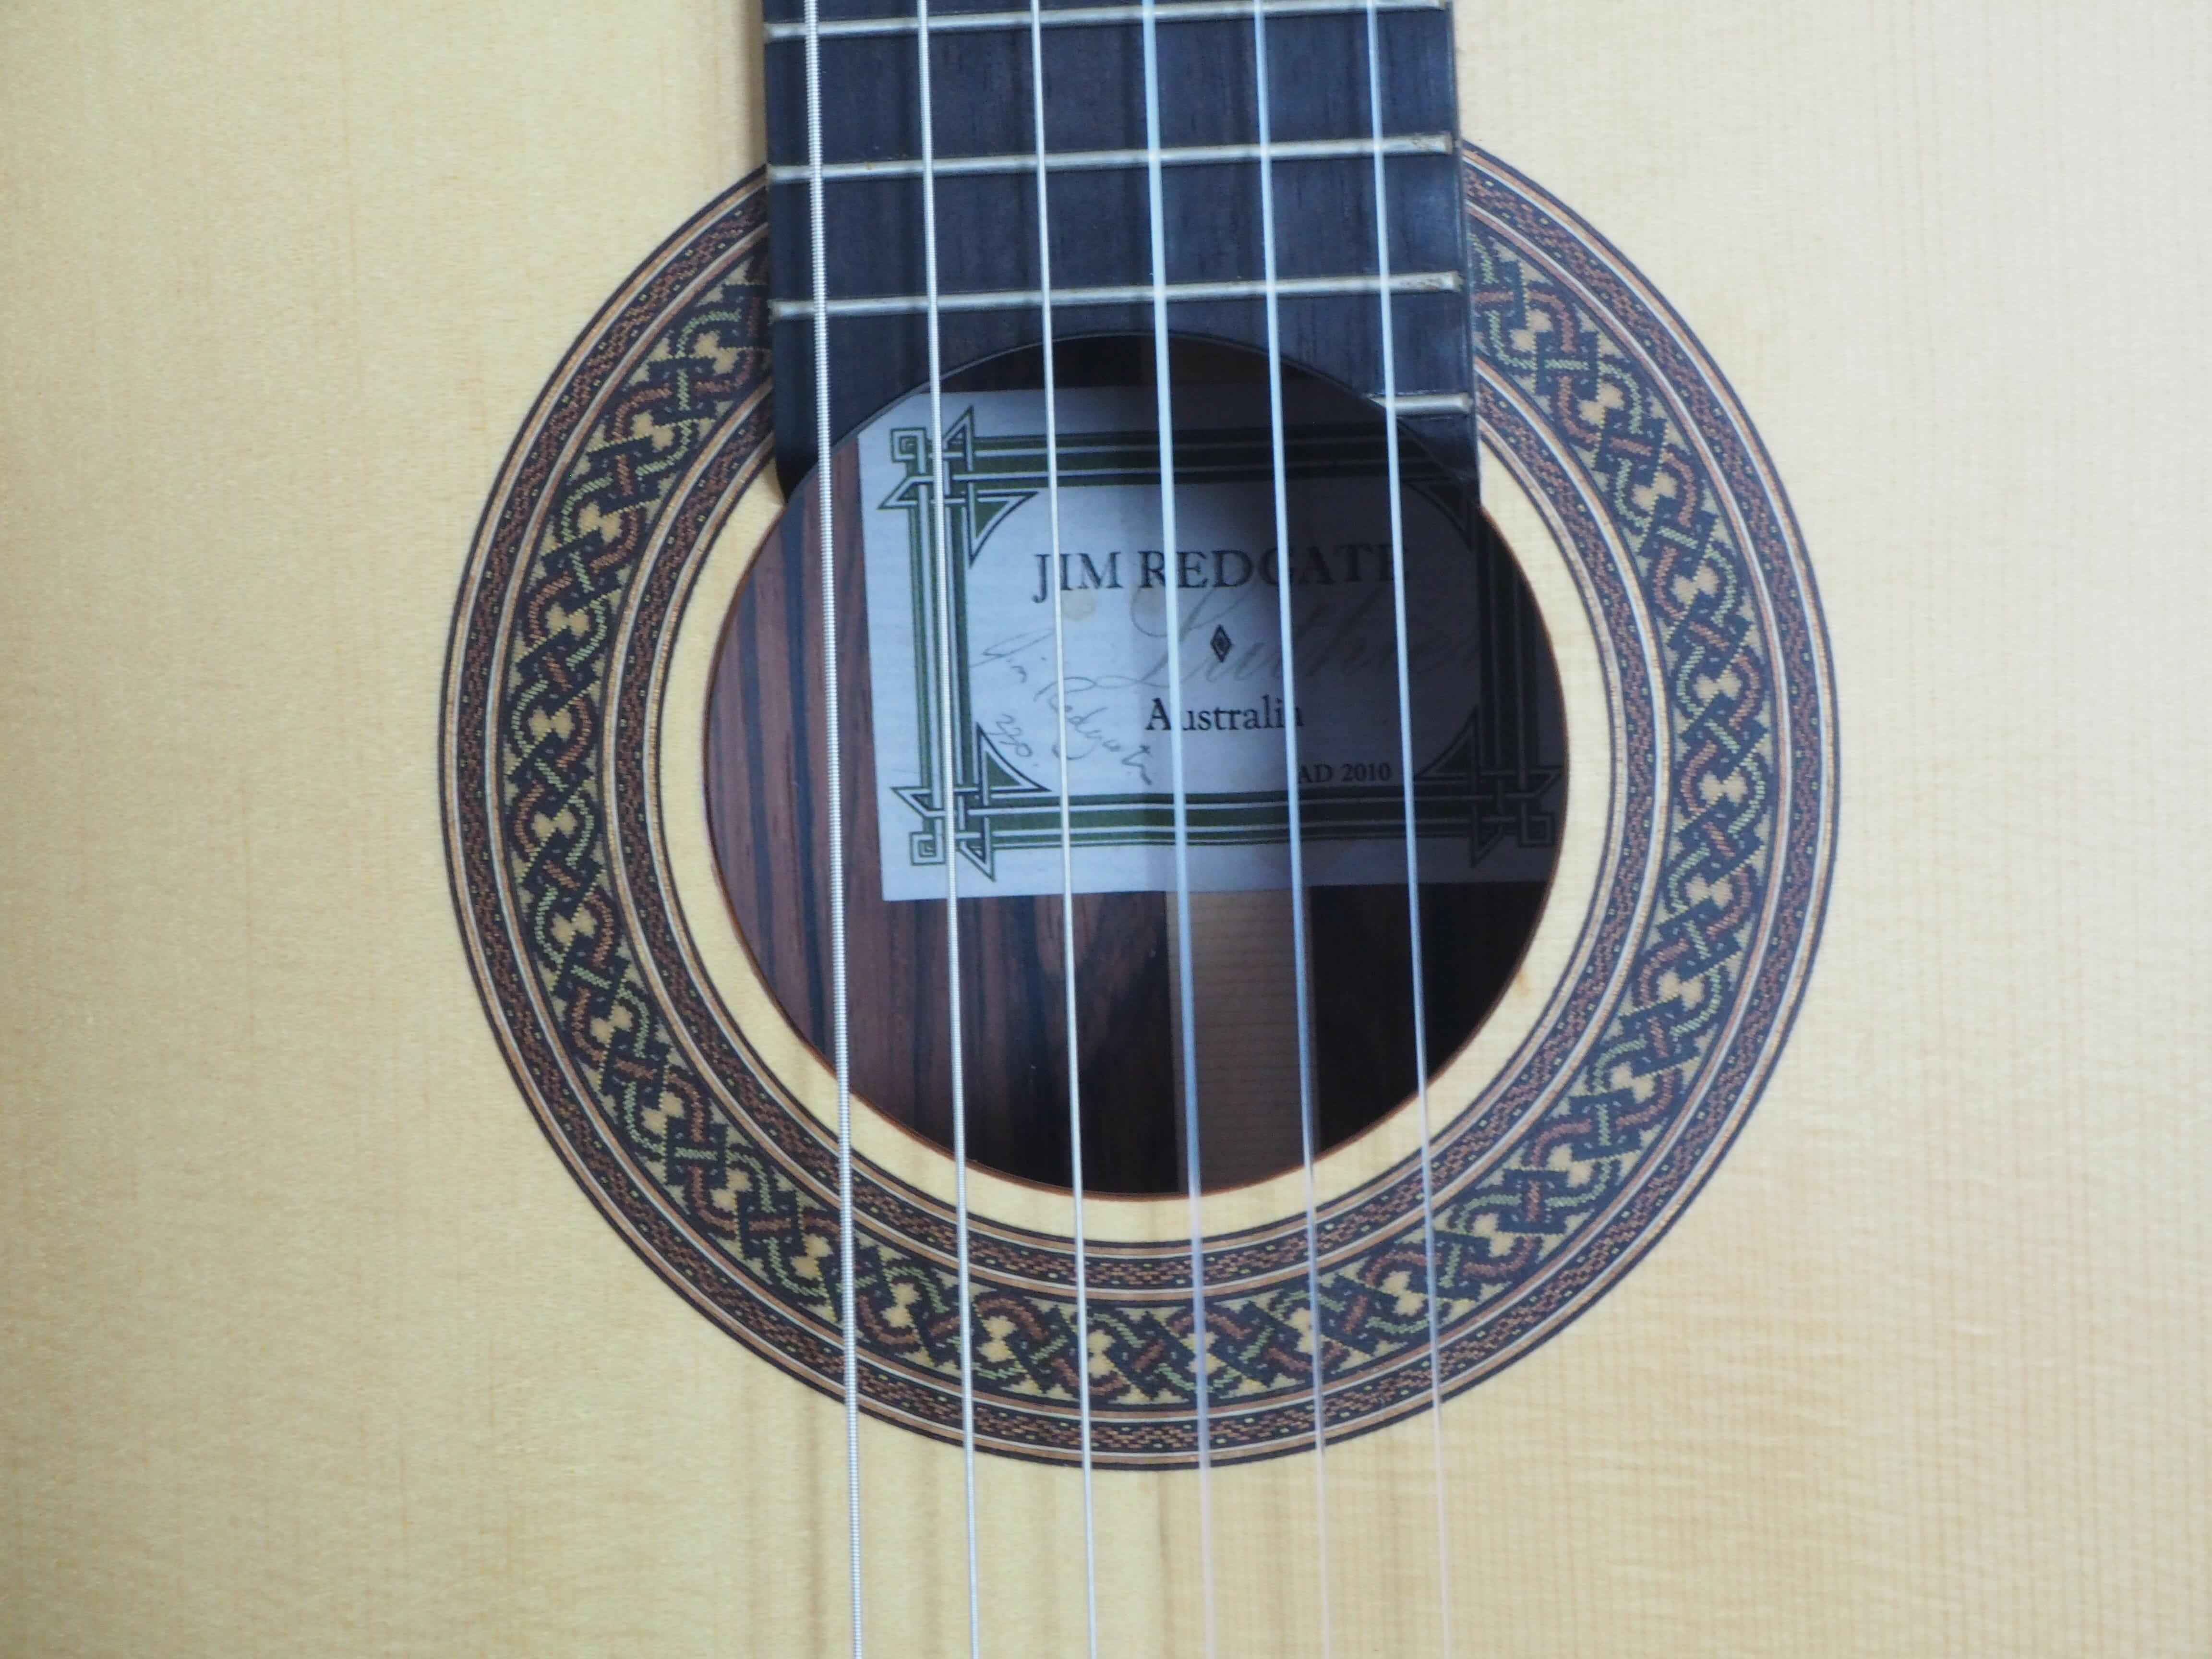 Luthier Jim Redgate 2010 classical guitar No  330